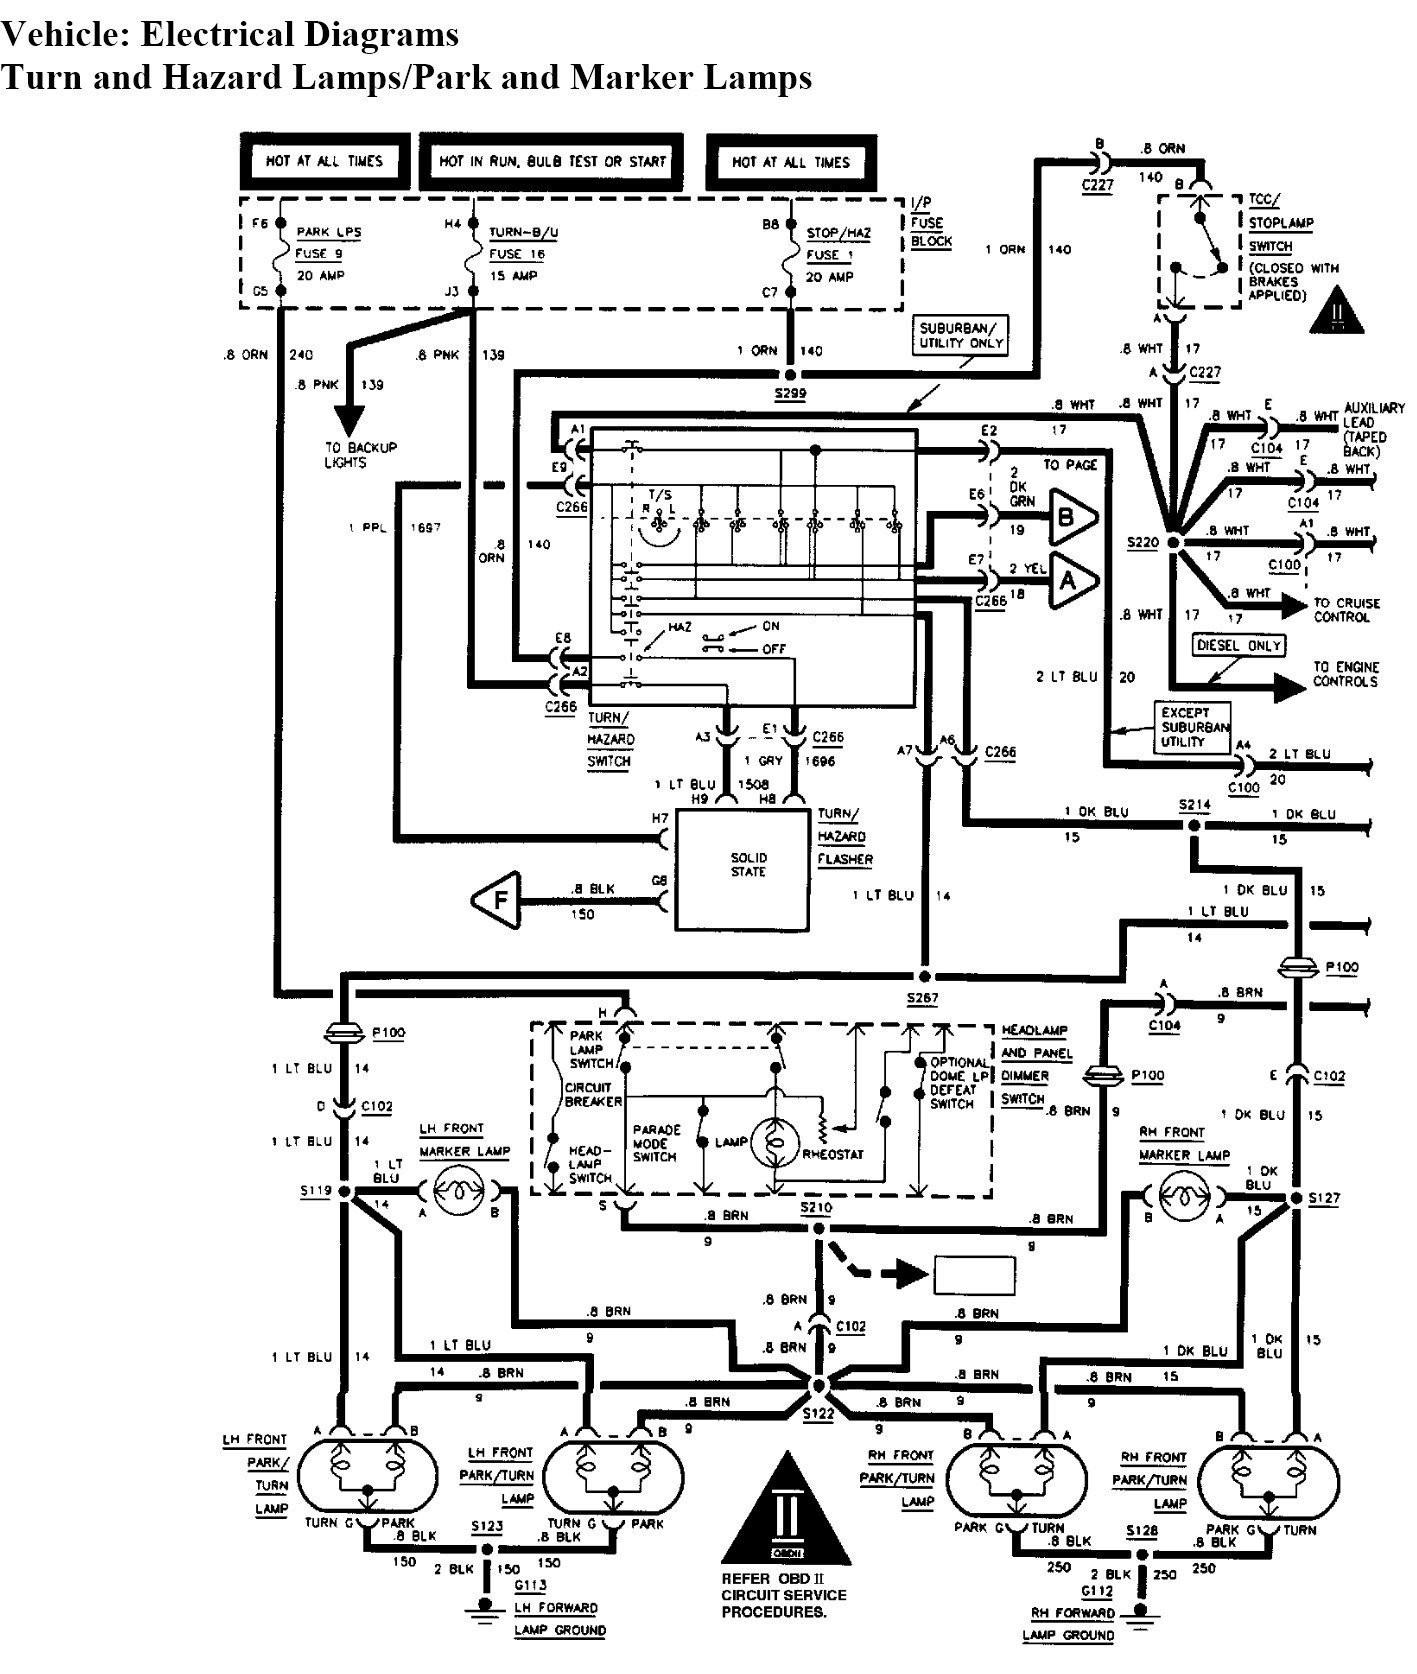 wiring diagram for a 1994 chevy silverado wiring get auto Chevrolet Silverado Wiring Diagram for Starter 1994 chevy truck brake light wiring diagram